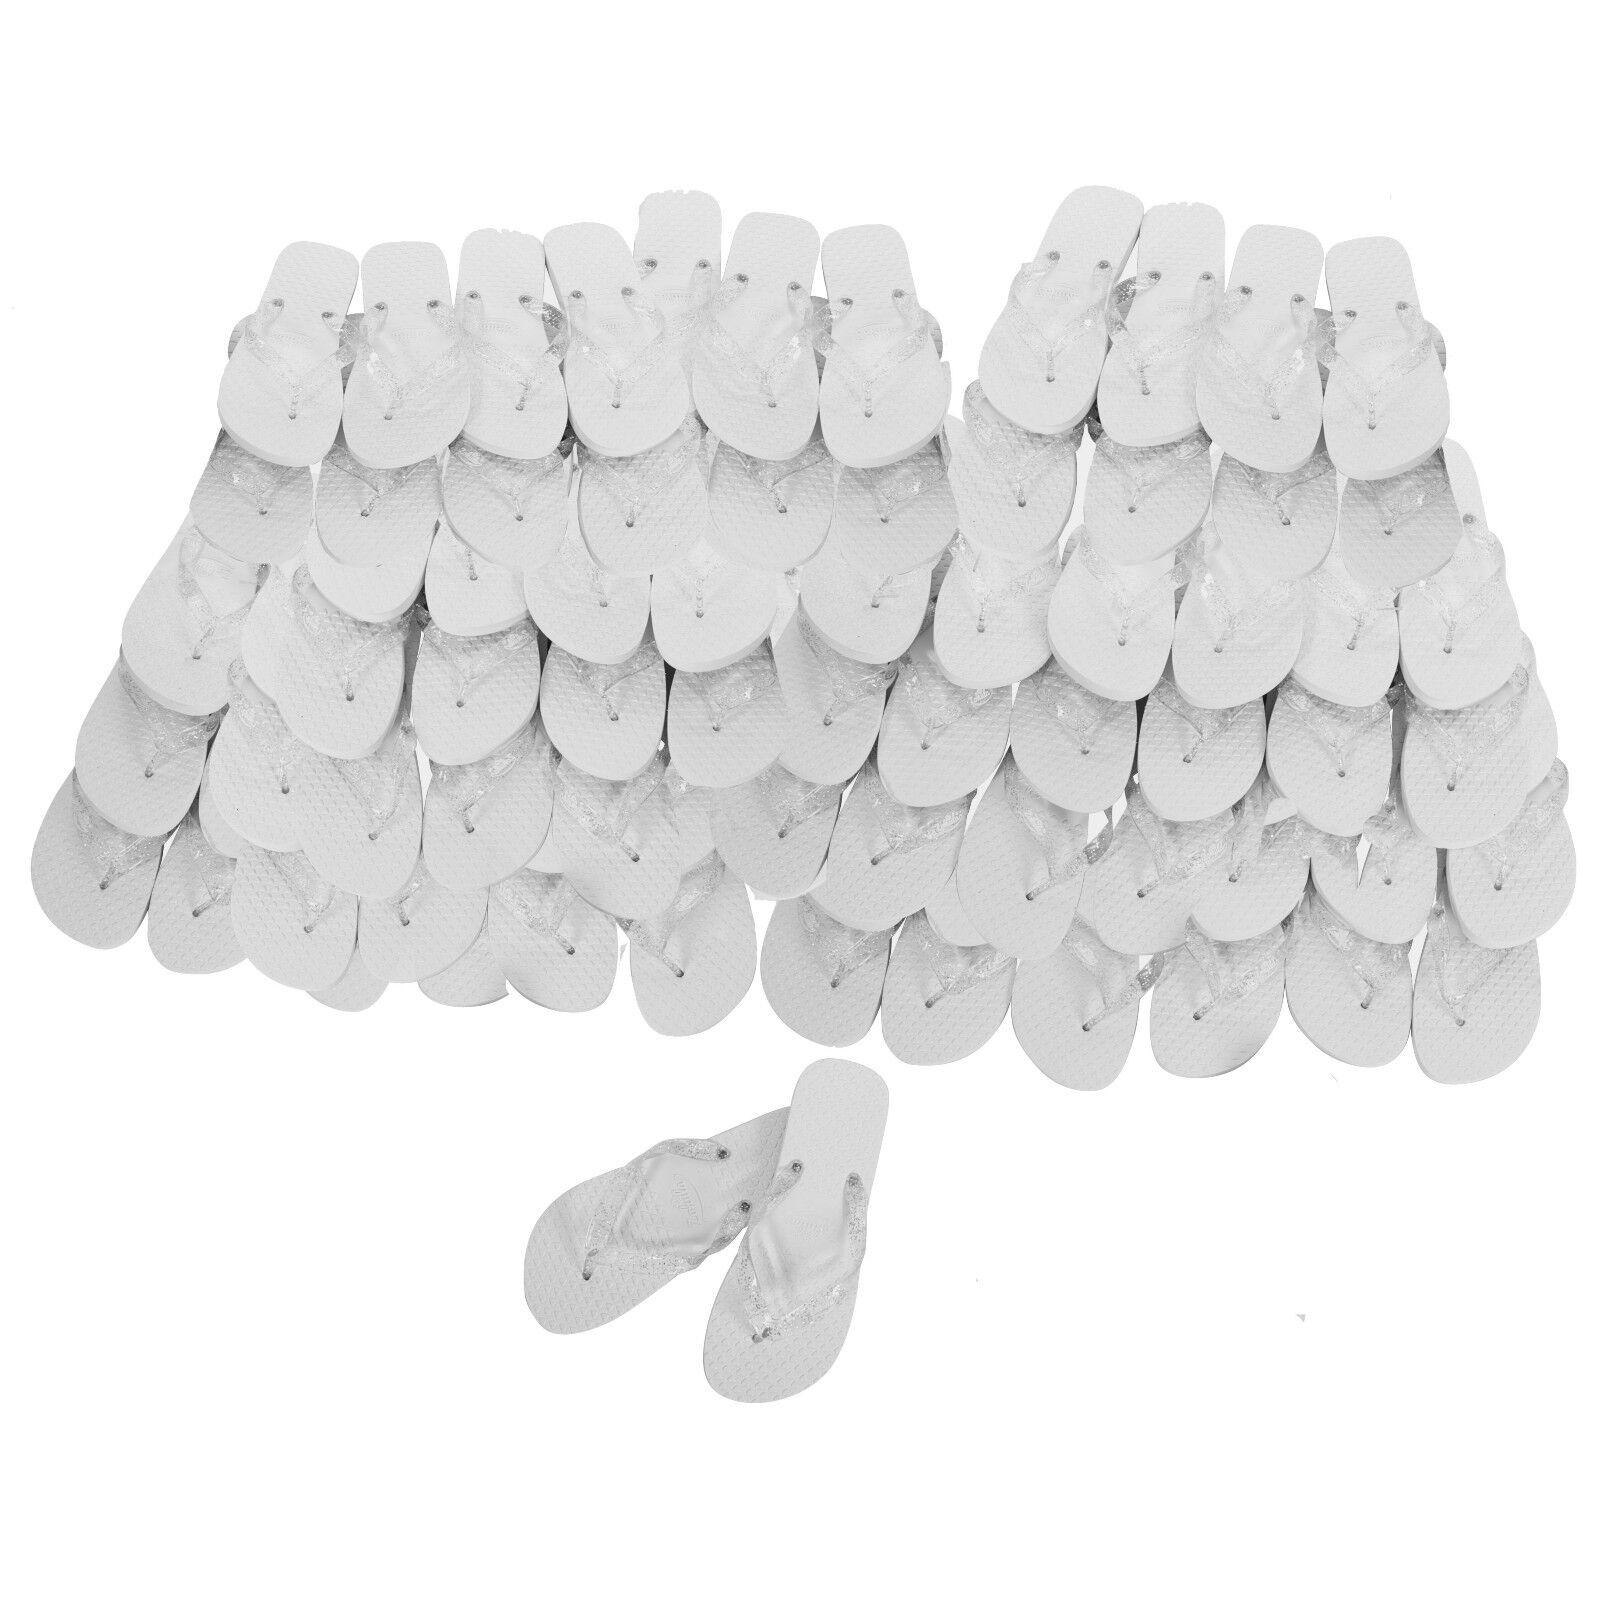 Zohula WEISS Wedding Flip Flops - Bulk Buy 10 - 100 pairs from  pair + lot